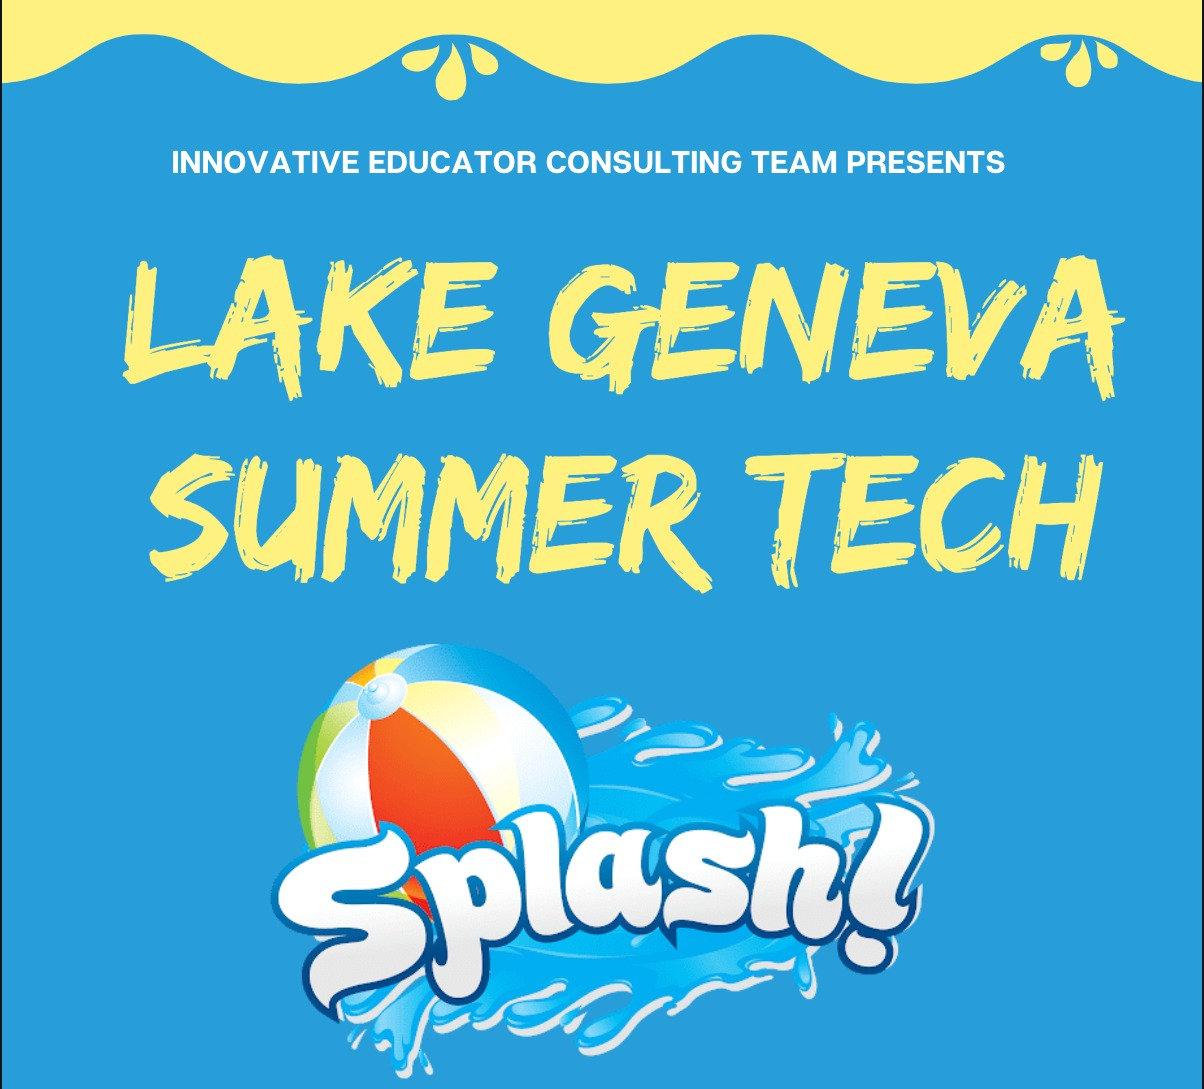 Individual Reg. LG Summer Tech Splash